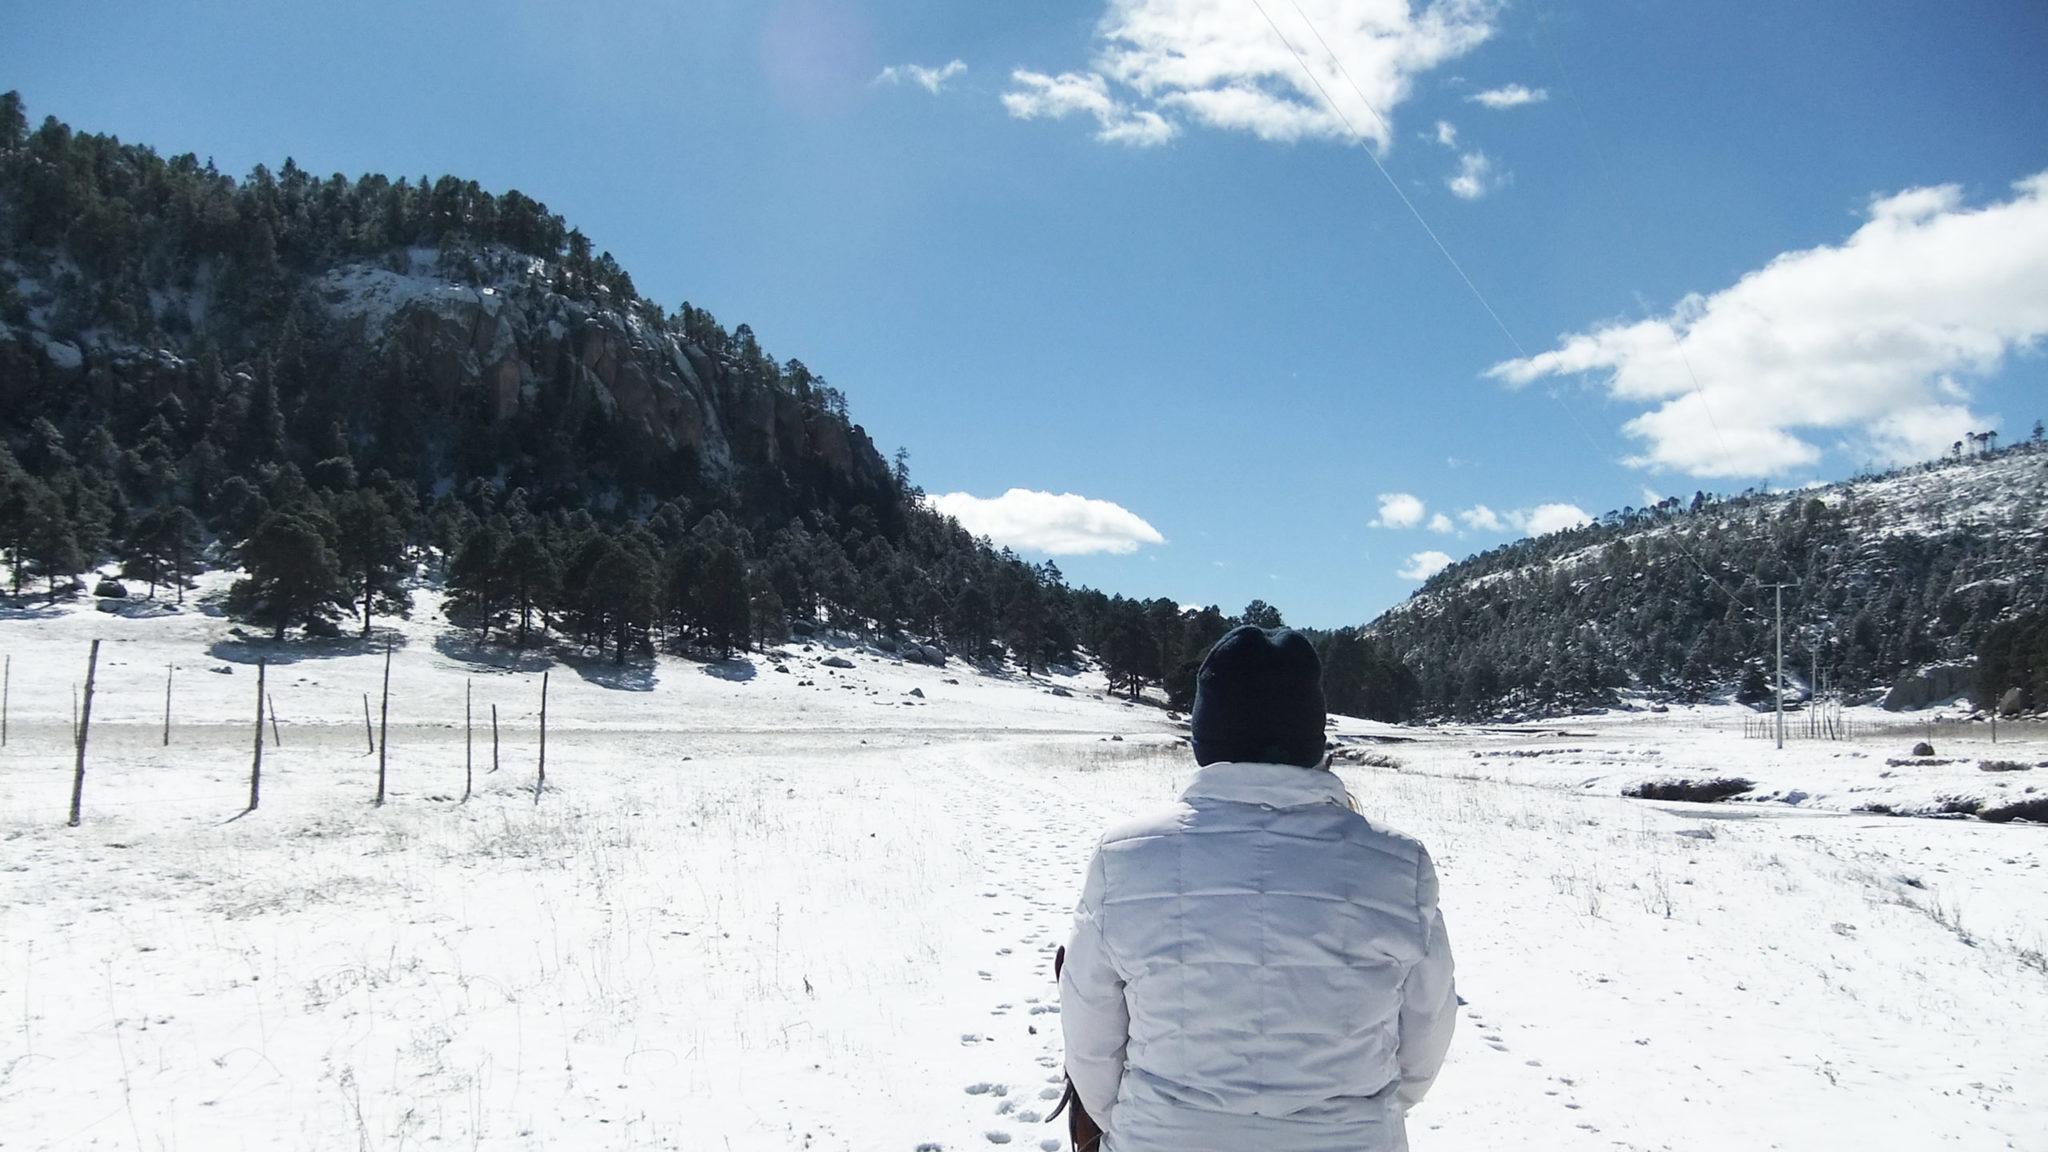 Creel, Chihuahua, nieve, México